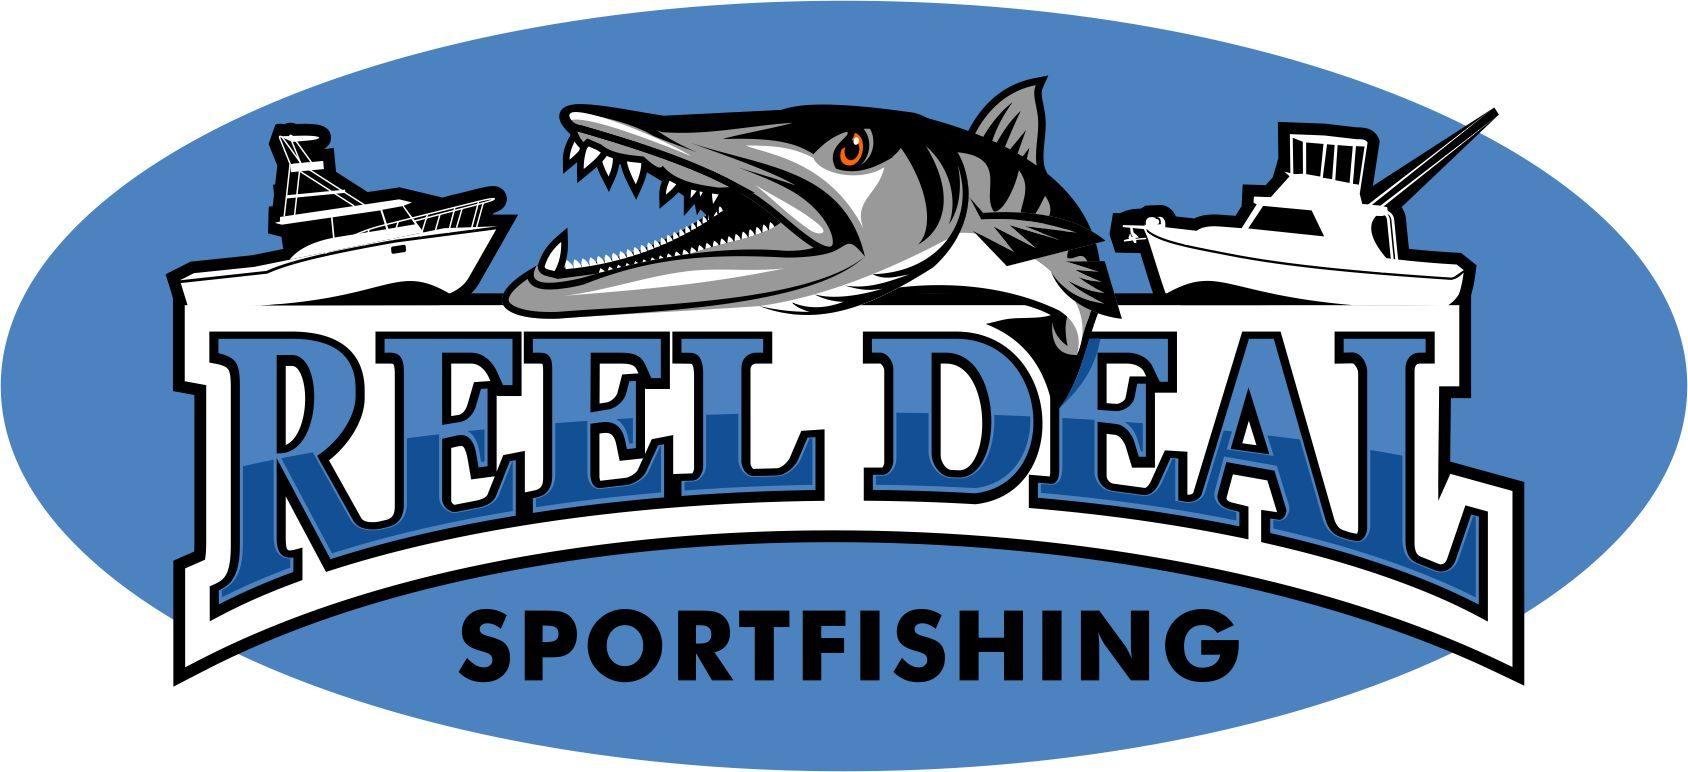 REEL DEAL SPORTFISHING – Clearwater Fishing Charters